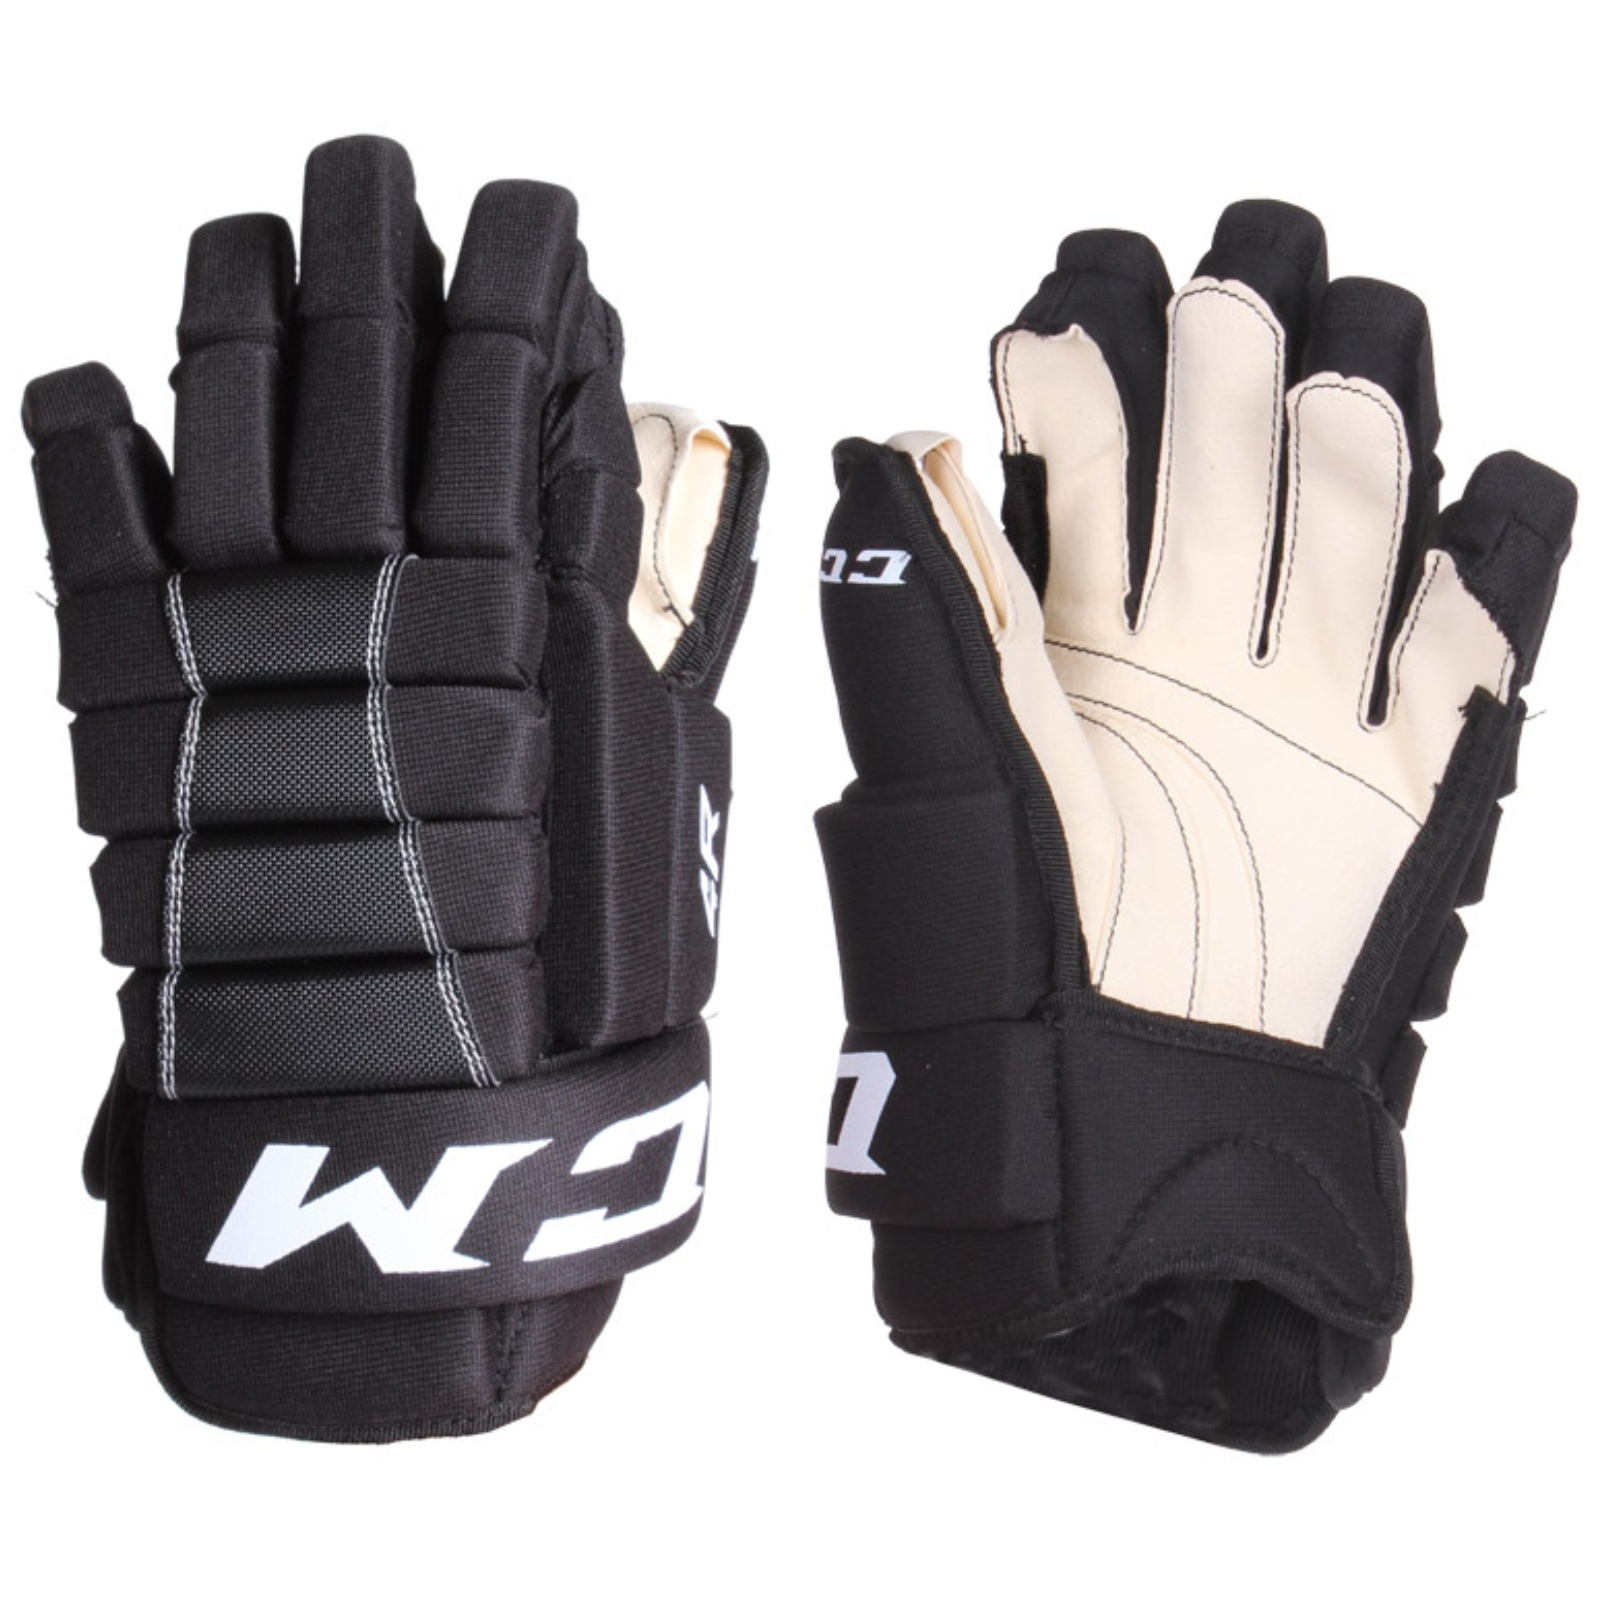 "Hokejové rukavice CCM 4R III senior, černo-bílé vel. 15"""